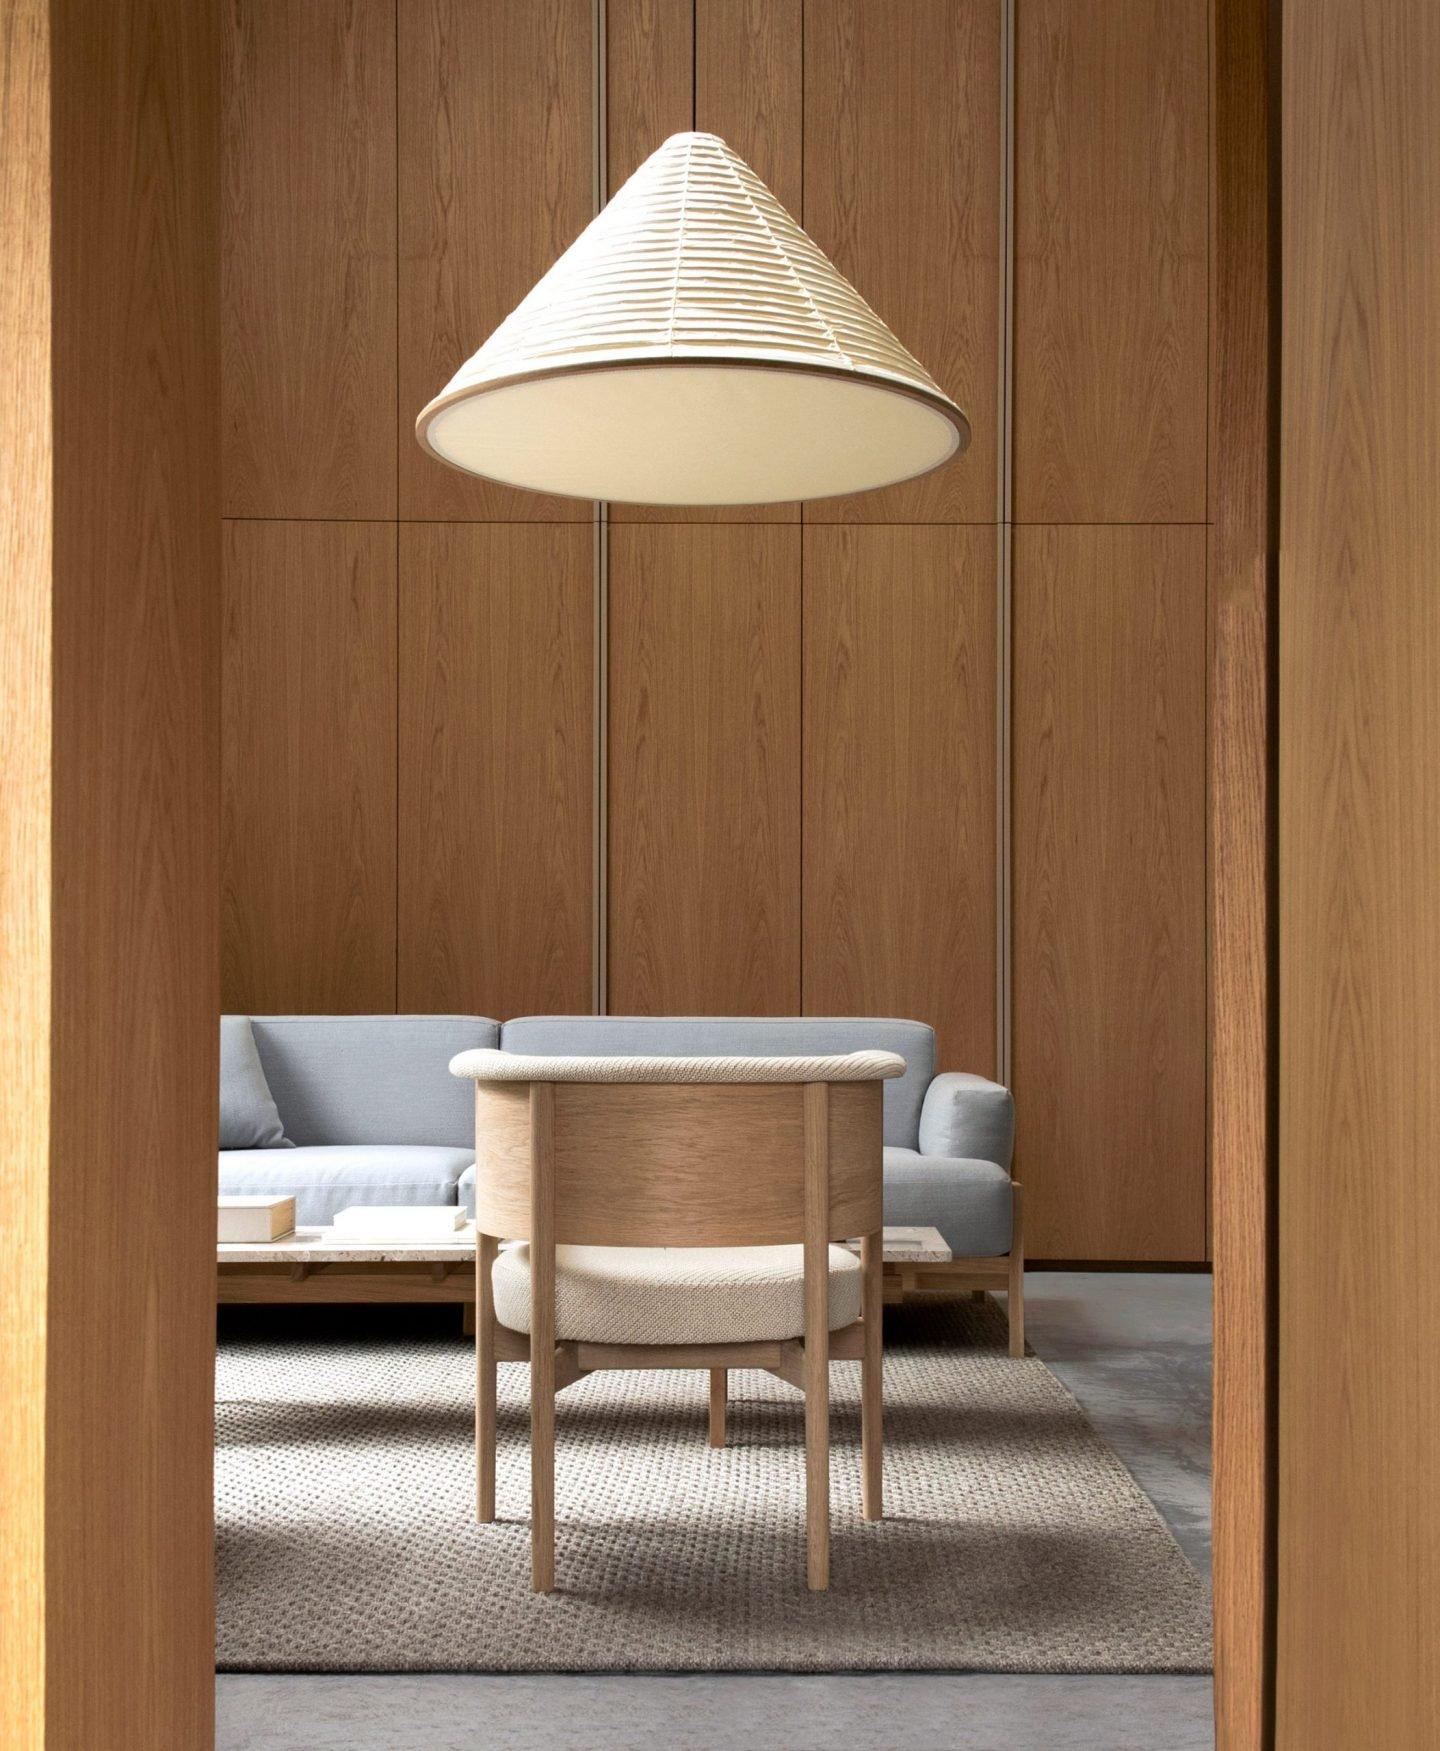 IGNANT-Architecture-Norm-Architects-Archipelago-House-09